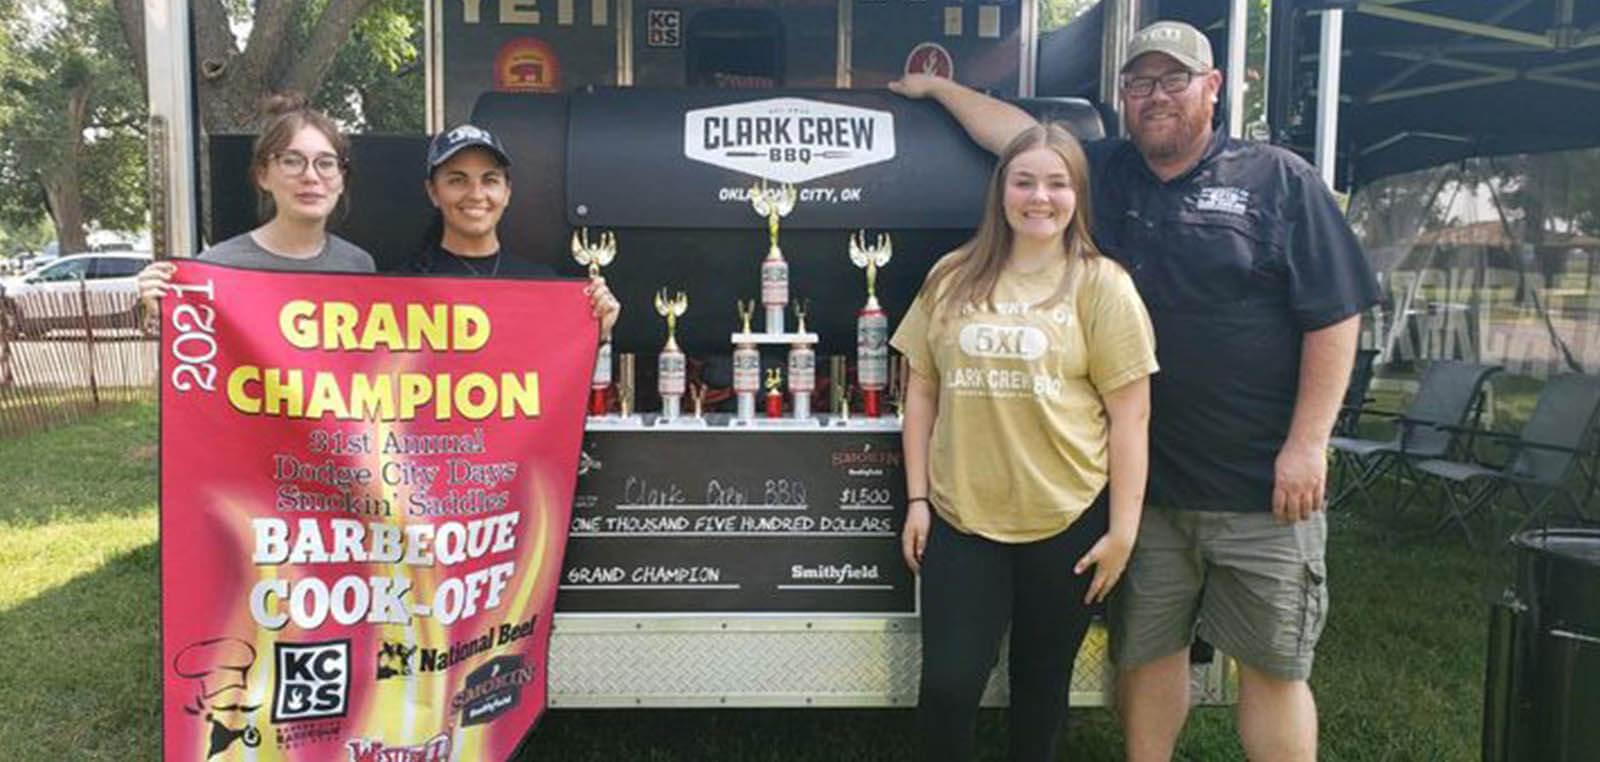 the Clark Crew BBQ team members